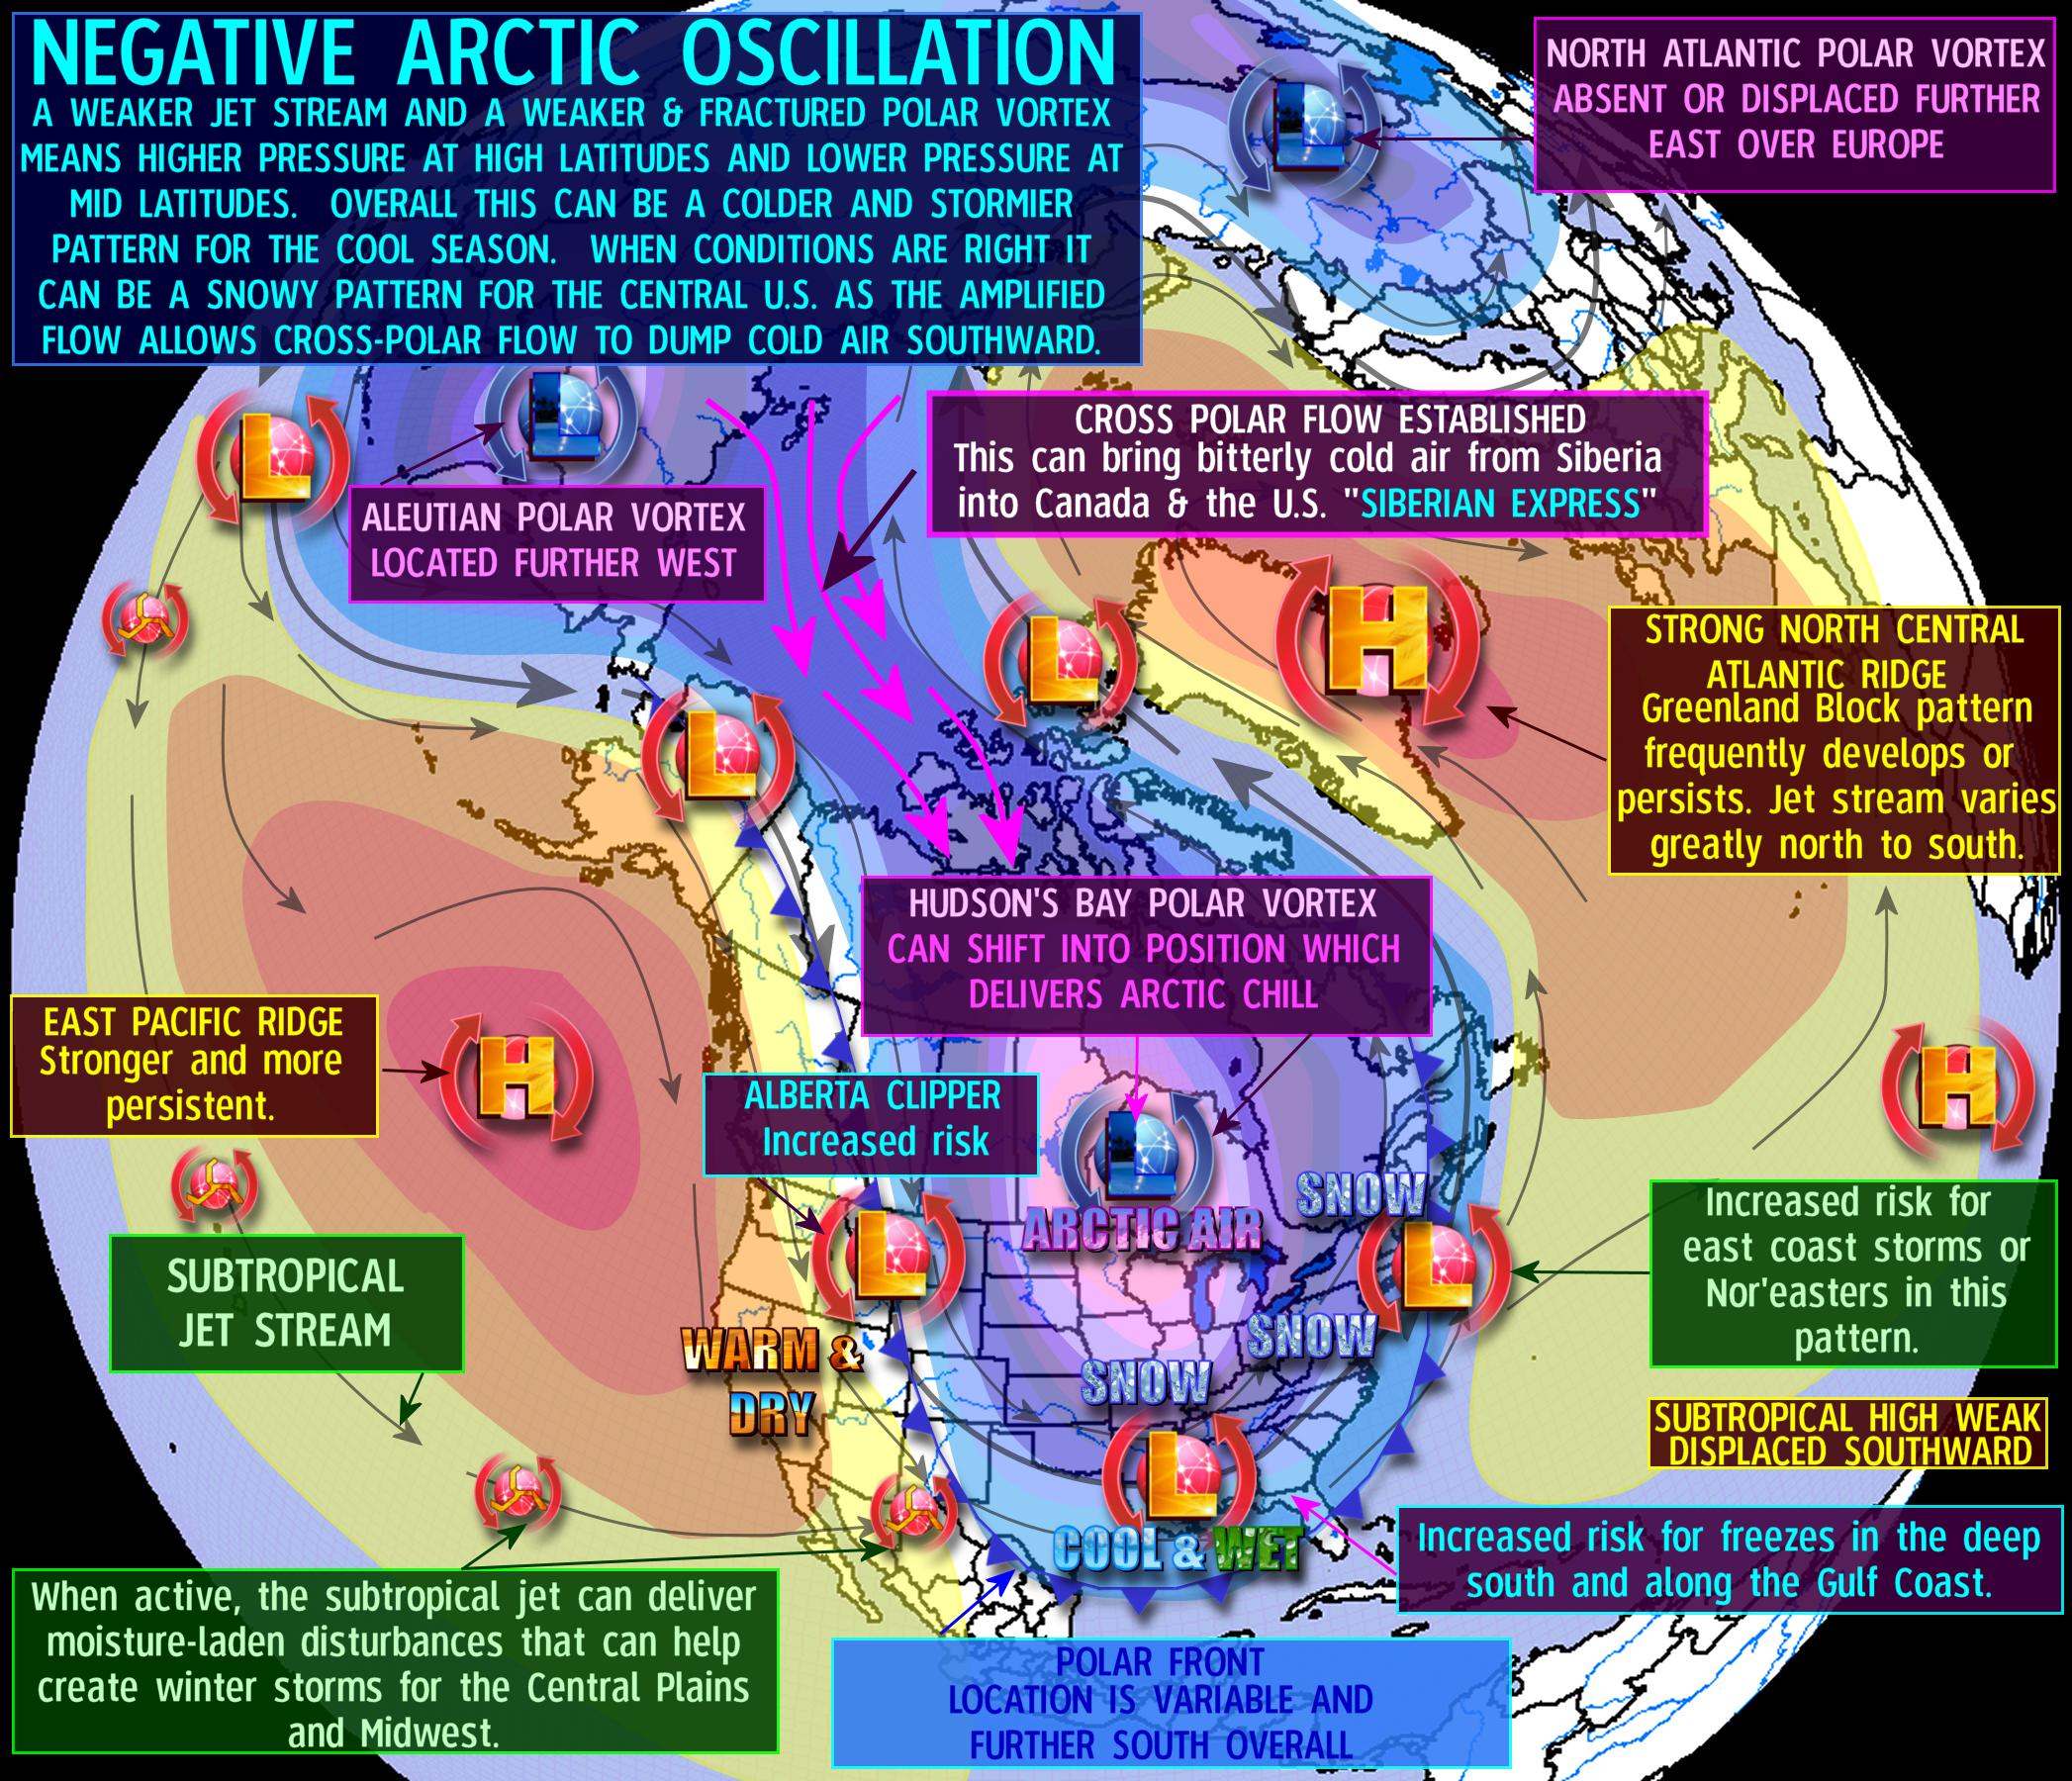 Arctic Oscillation Index (AO)